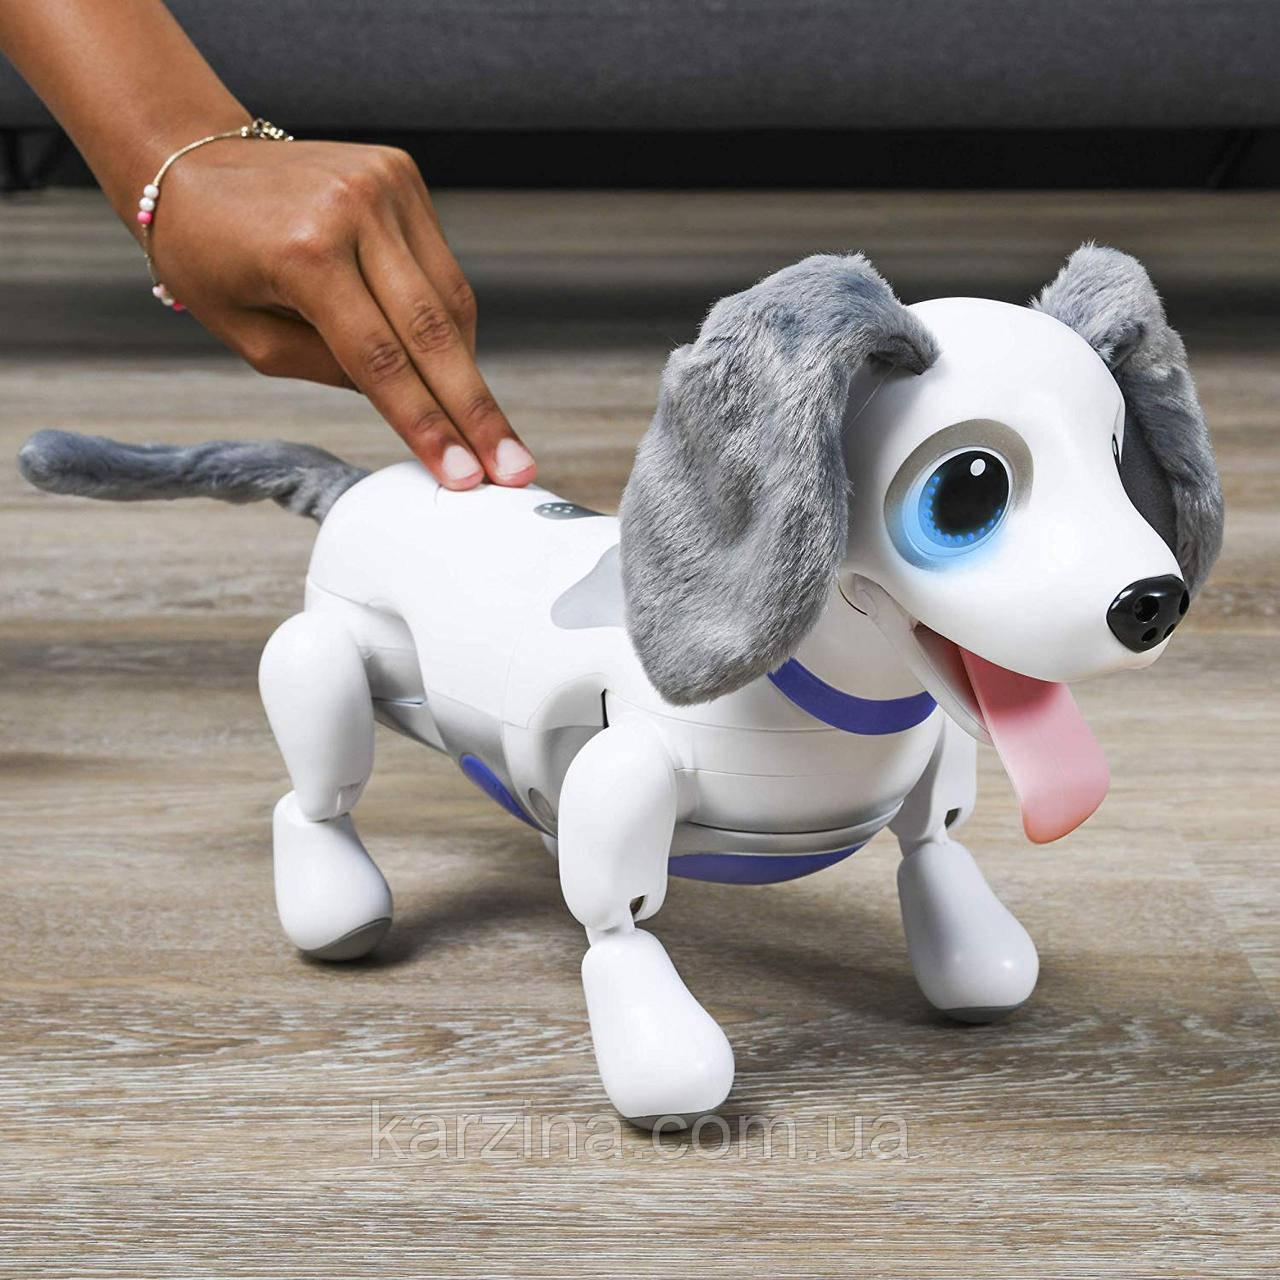 Интерактивная собака робот-игрушка Zoomer Playful Pup от Spin Master